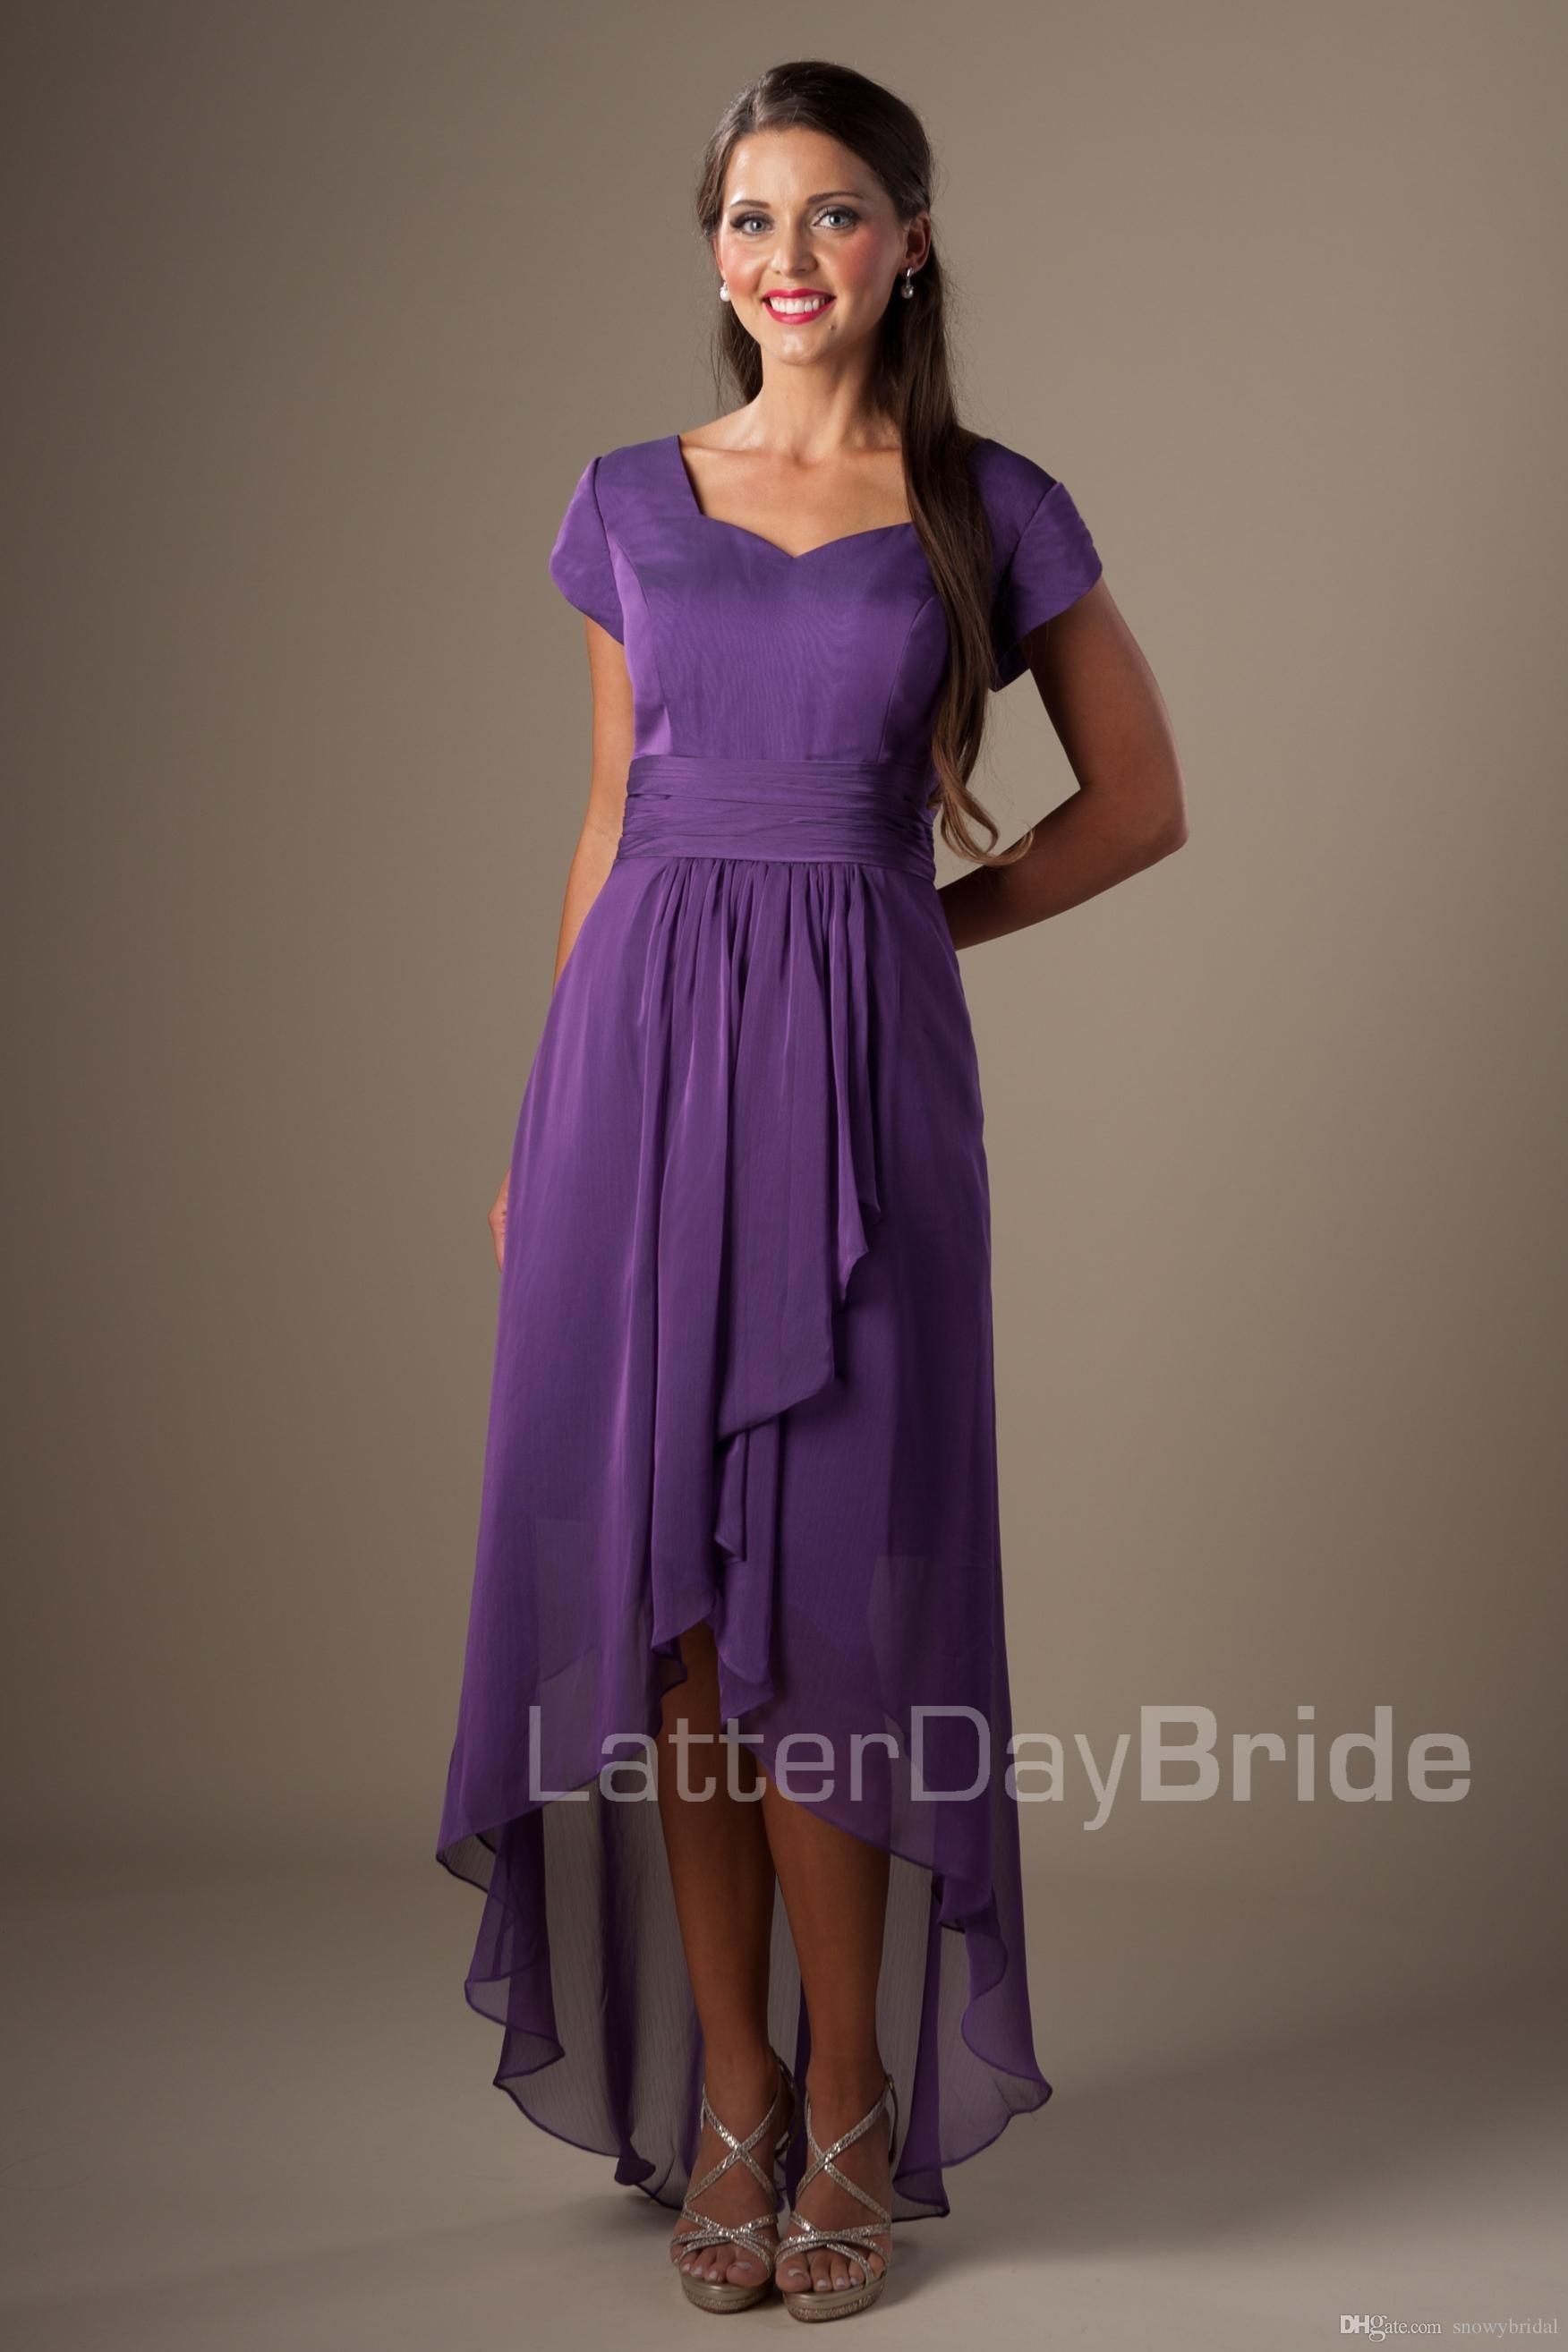 Elegant Kleid Lang Lila VertriebAbend Großartig Kleid Lang Lila Ärmel